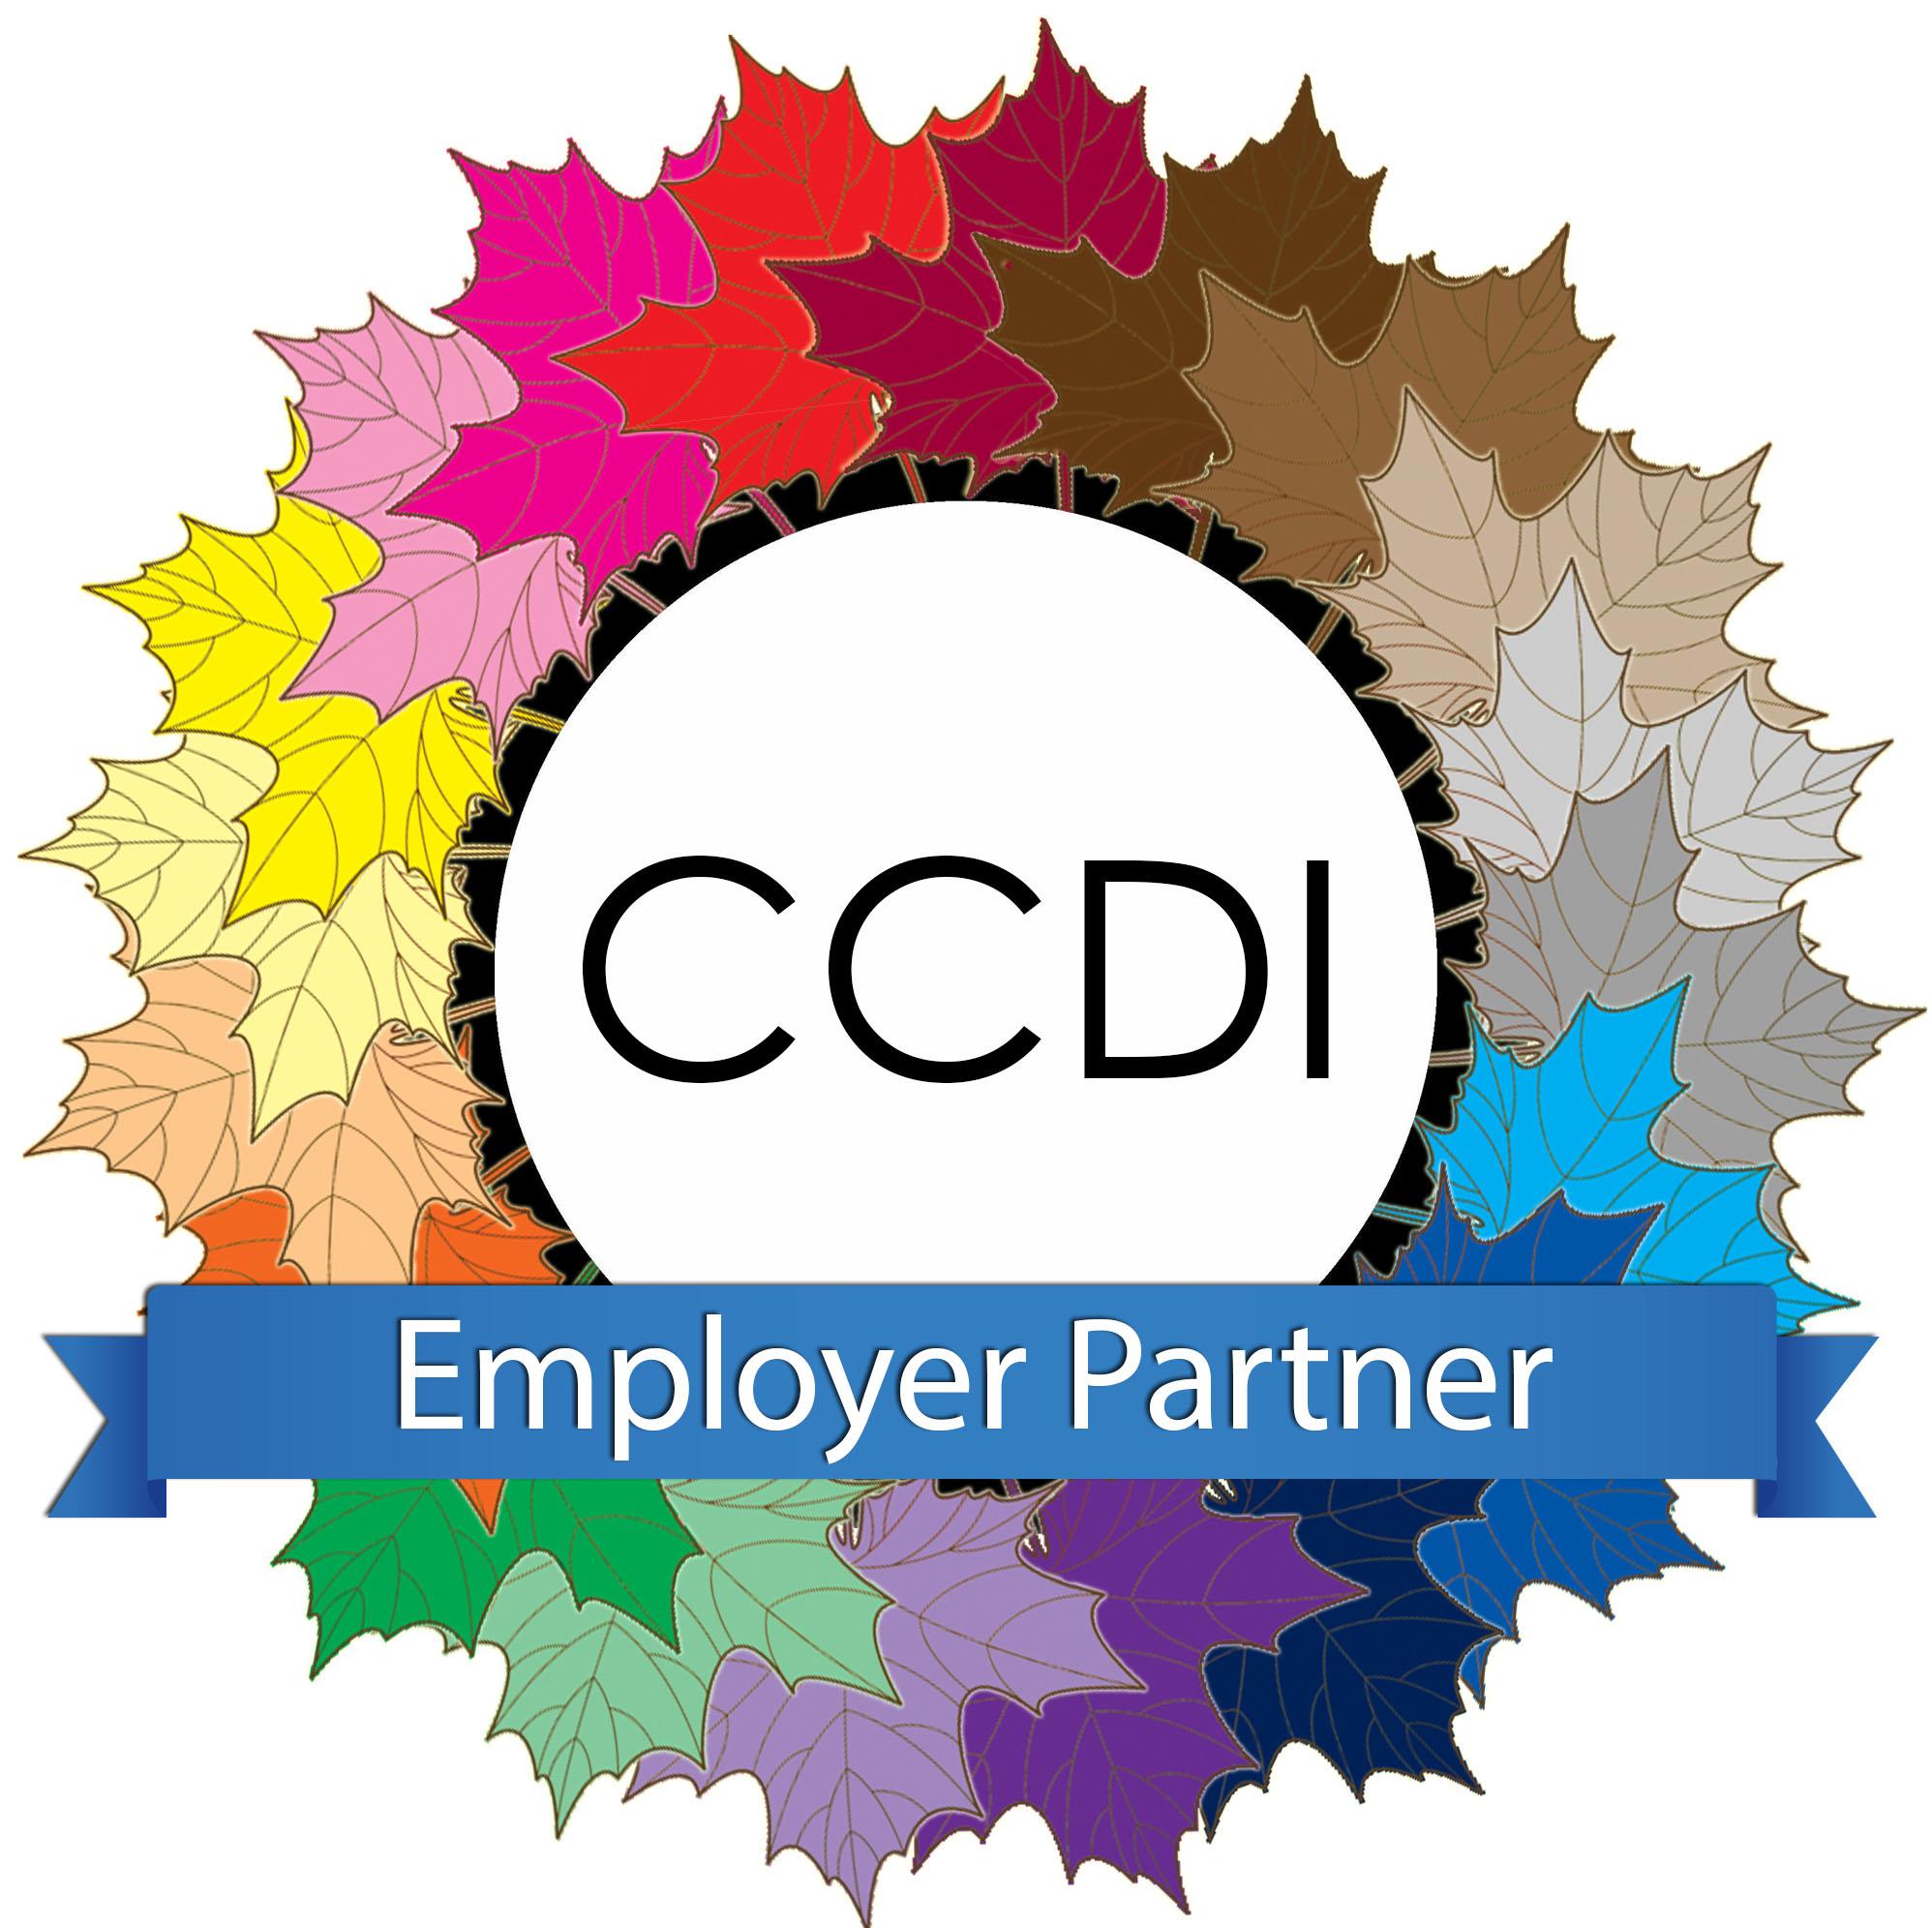 Colourful leaf CCDI Employer Partner logo